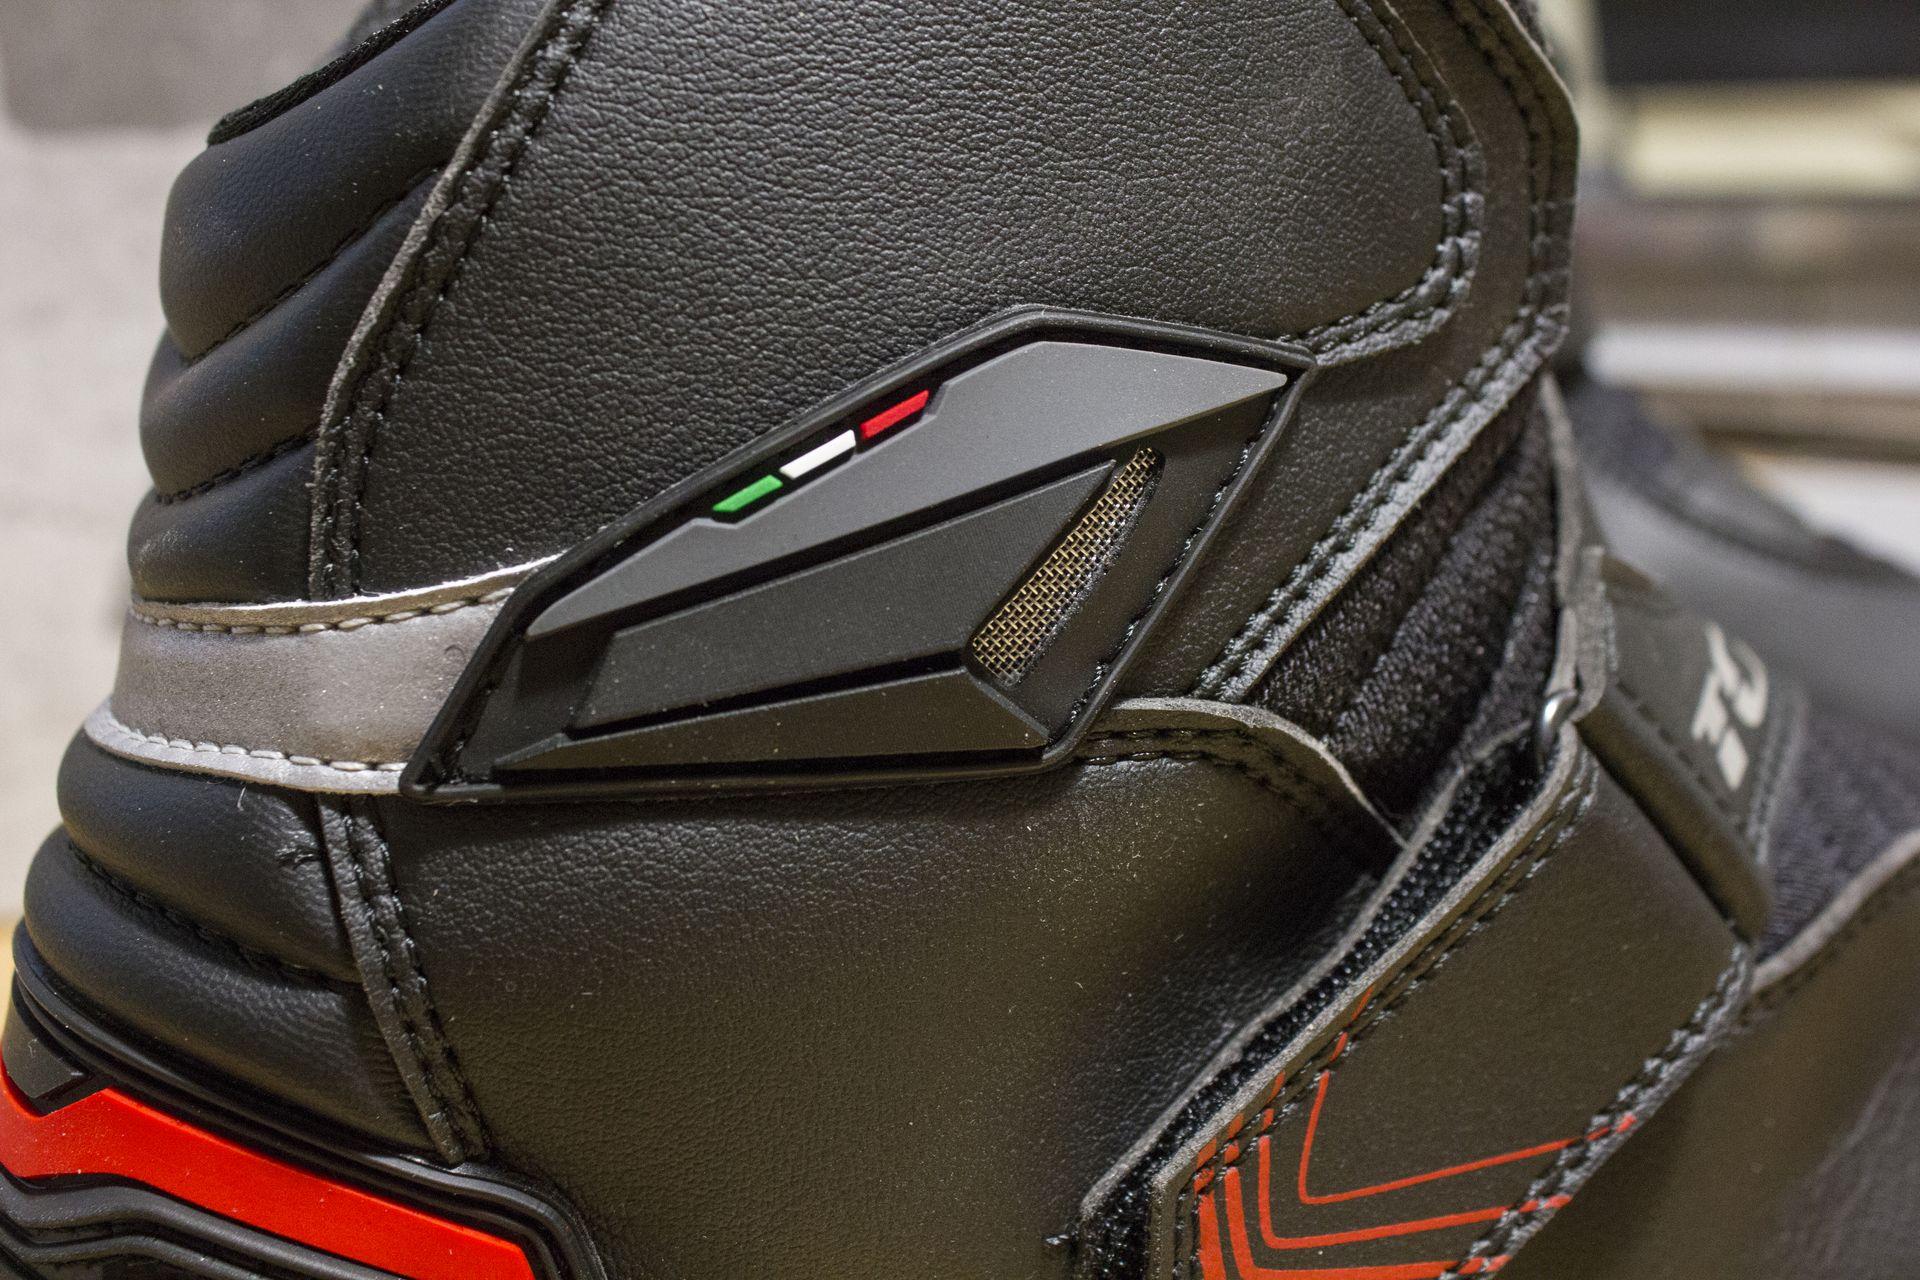 TCX Roadster 2 - renfort malléole